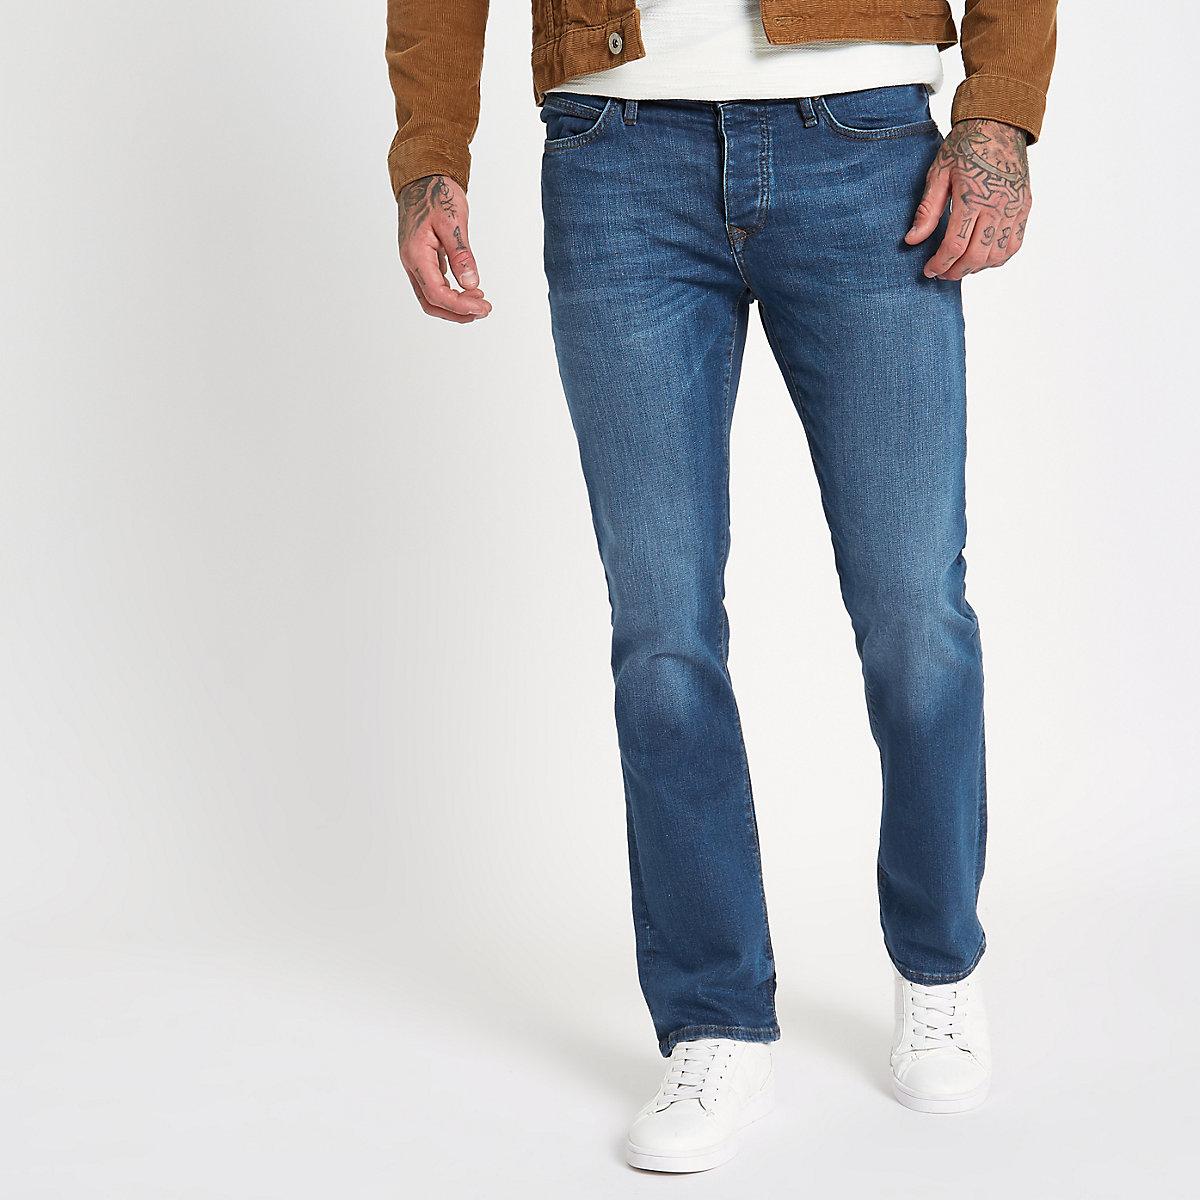 Blue bootcut jeans